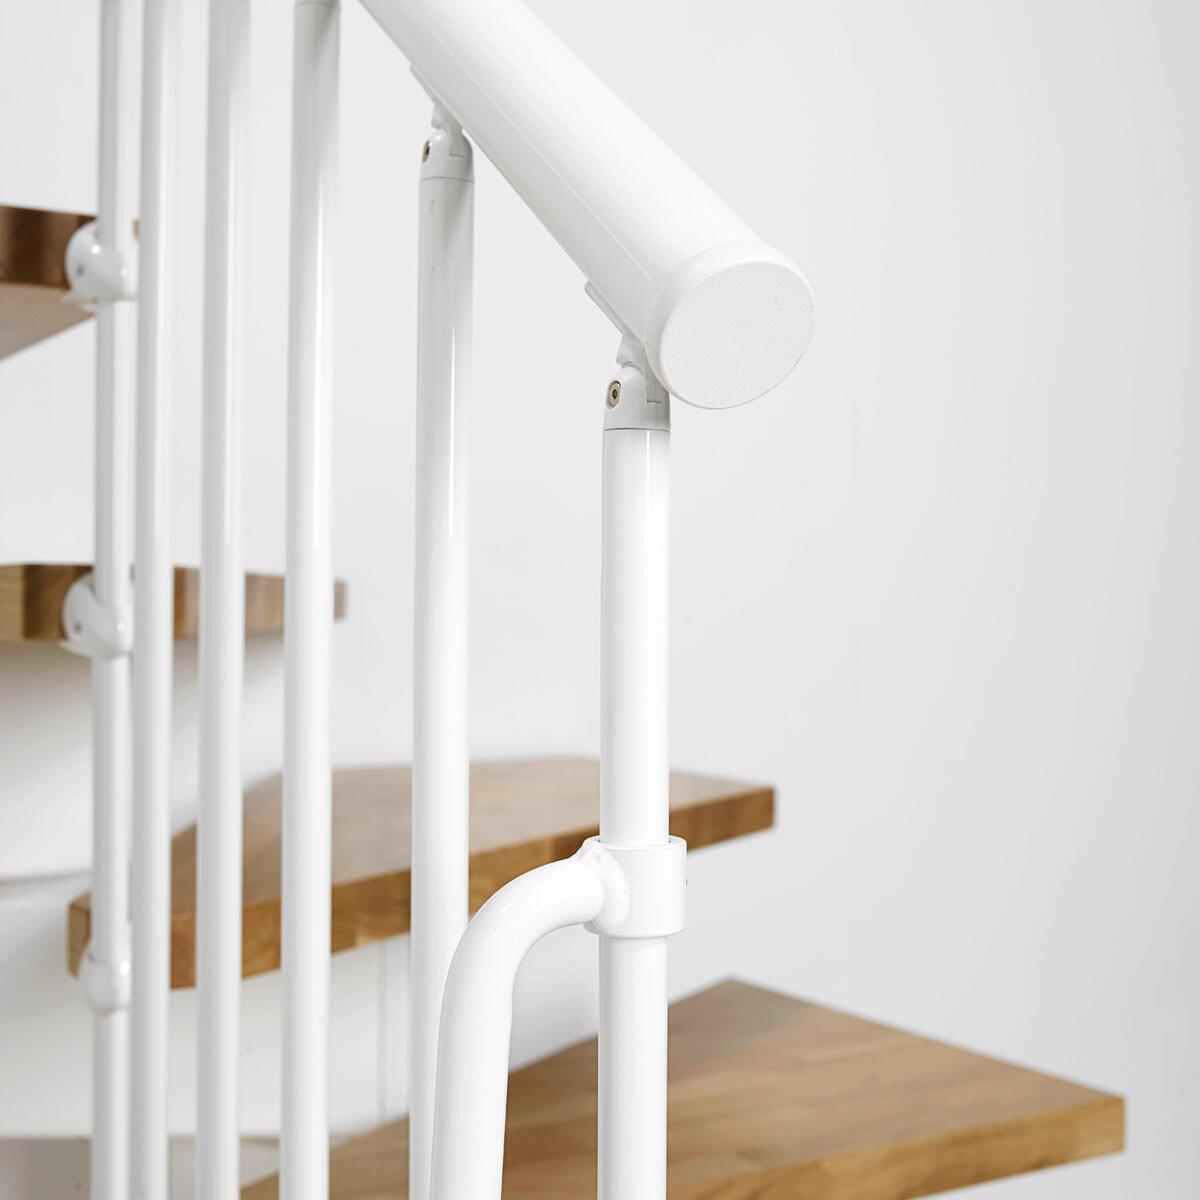 Scala a rampa 1/4 di giro OAK90 FONTANOT L 90 cm, gradino rovere, struttura bianco - 9